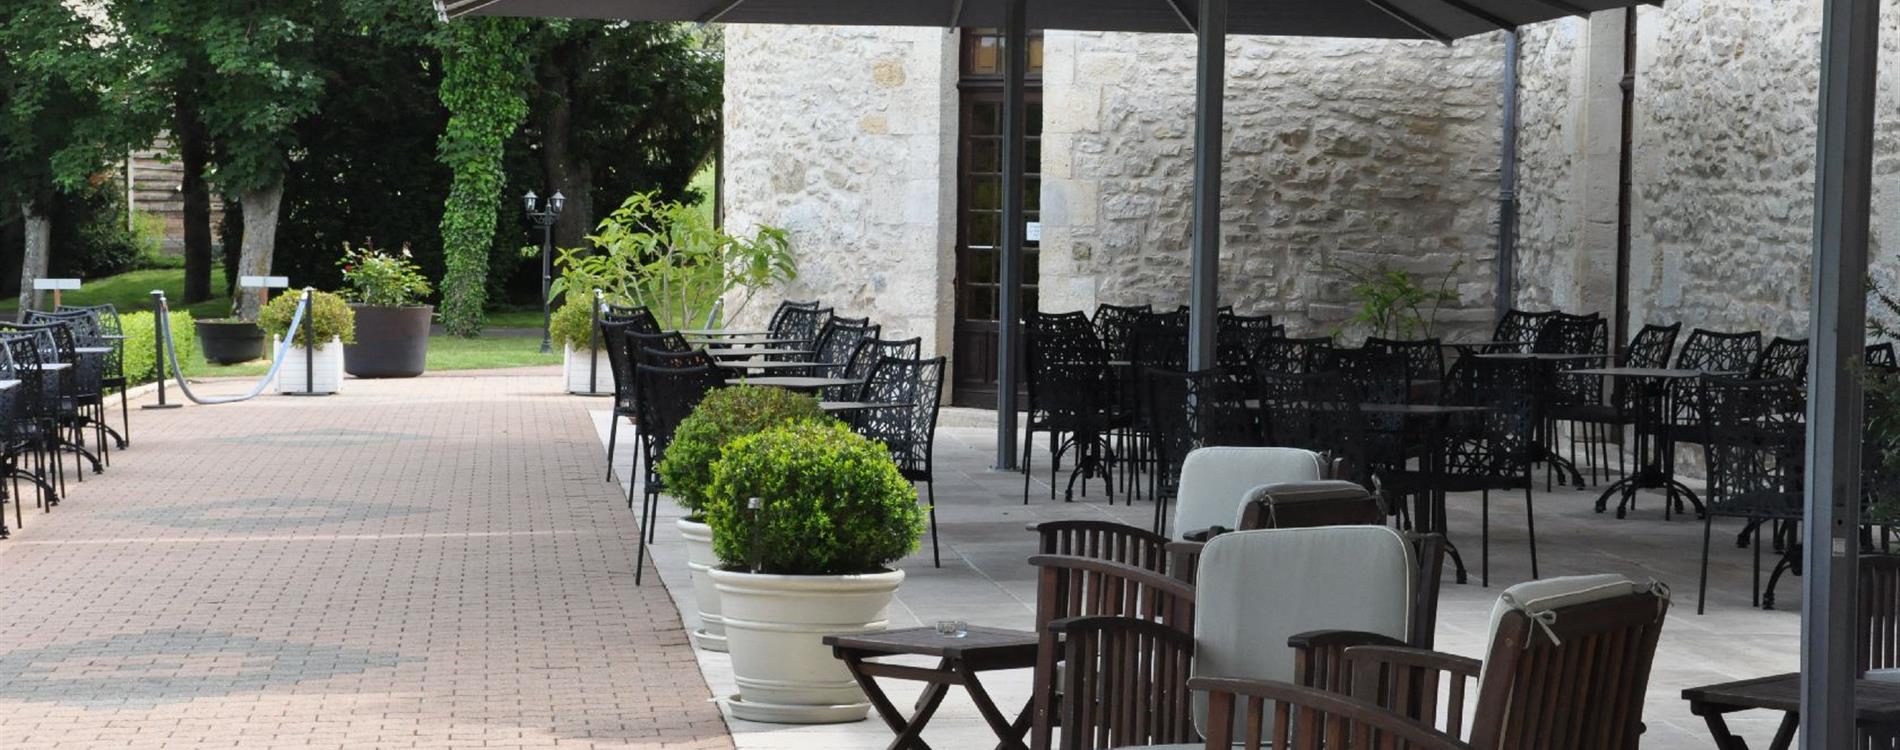 Hotel Pas Cher Proche Rodez